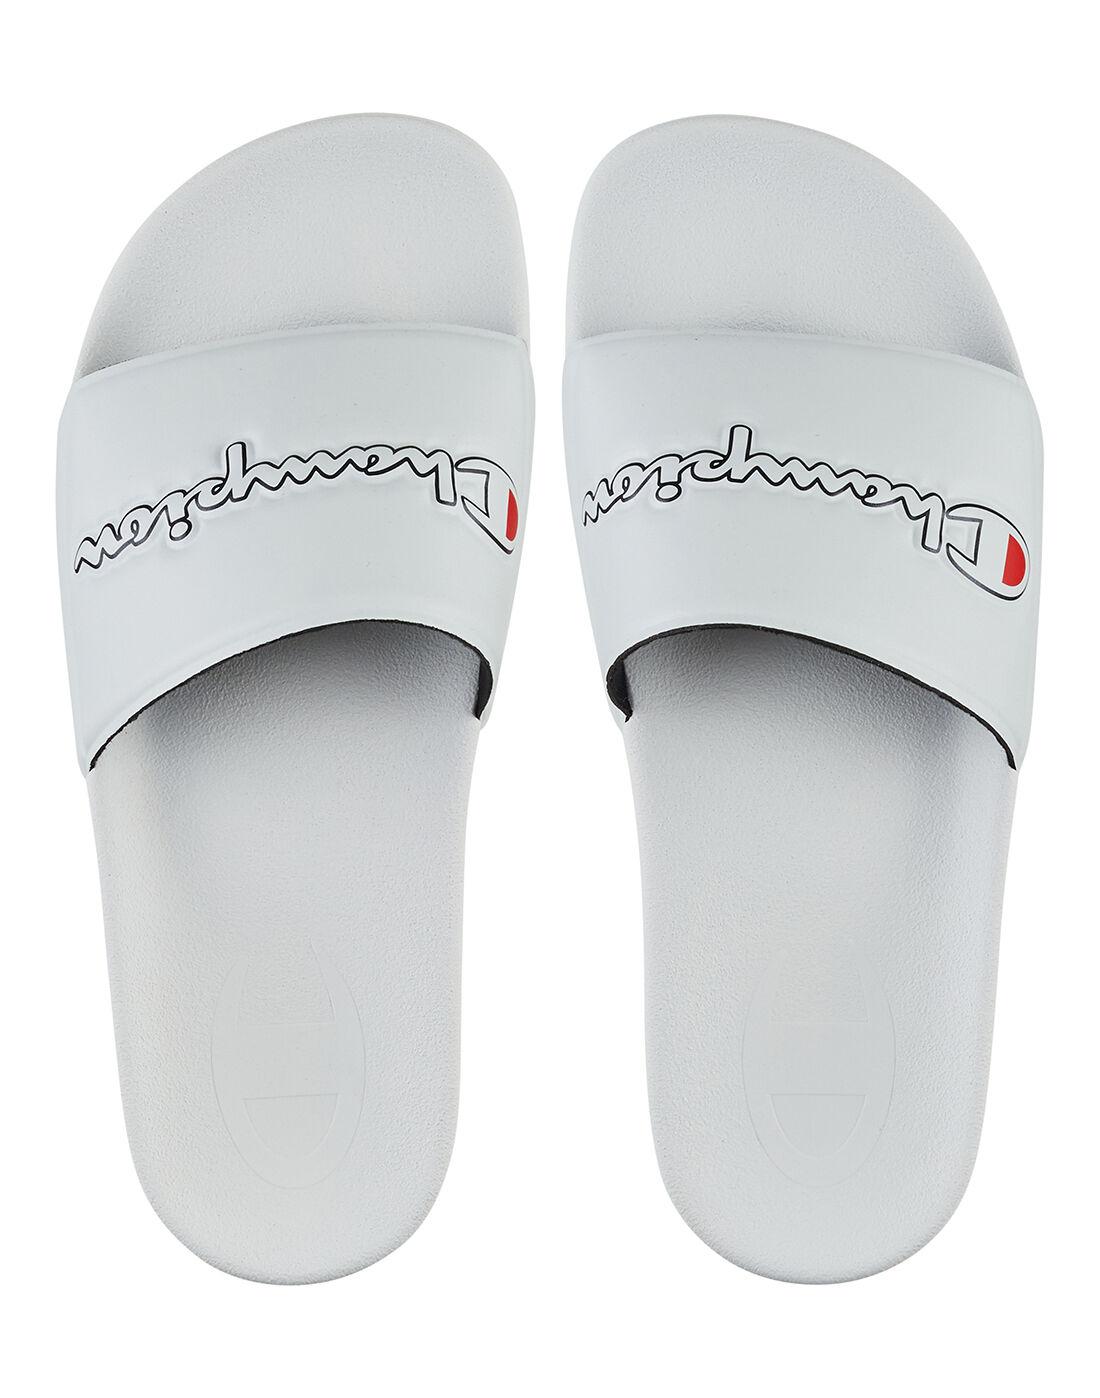 Champion adidas cq0928 sneakers boys running   Womens Evo Script Slides